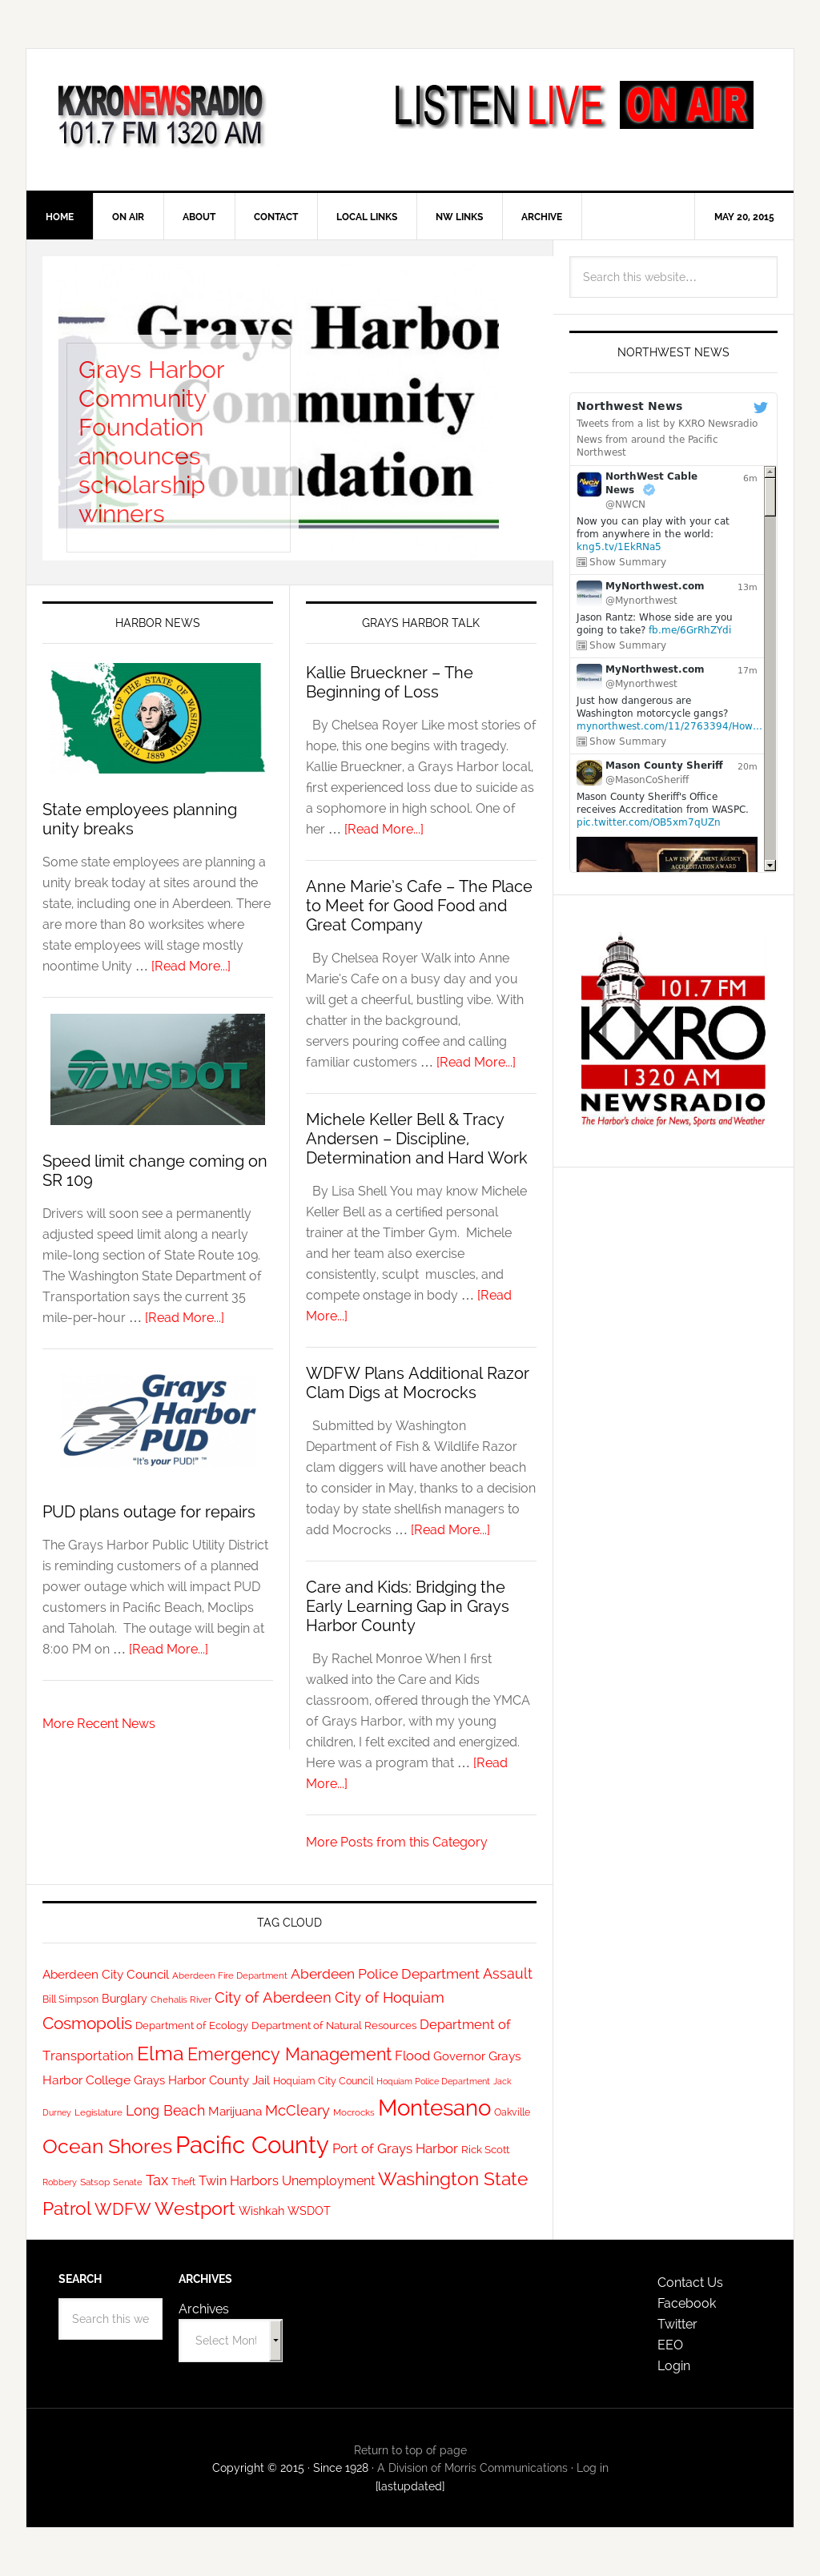 Grays Harbor Radio Competitors, Revenue and Employees - Owler